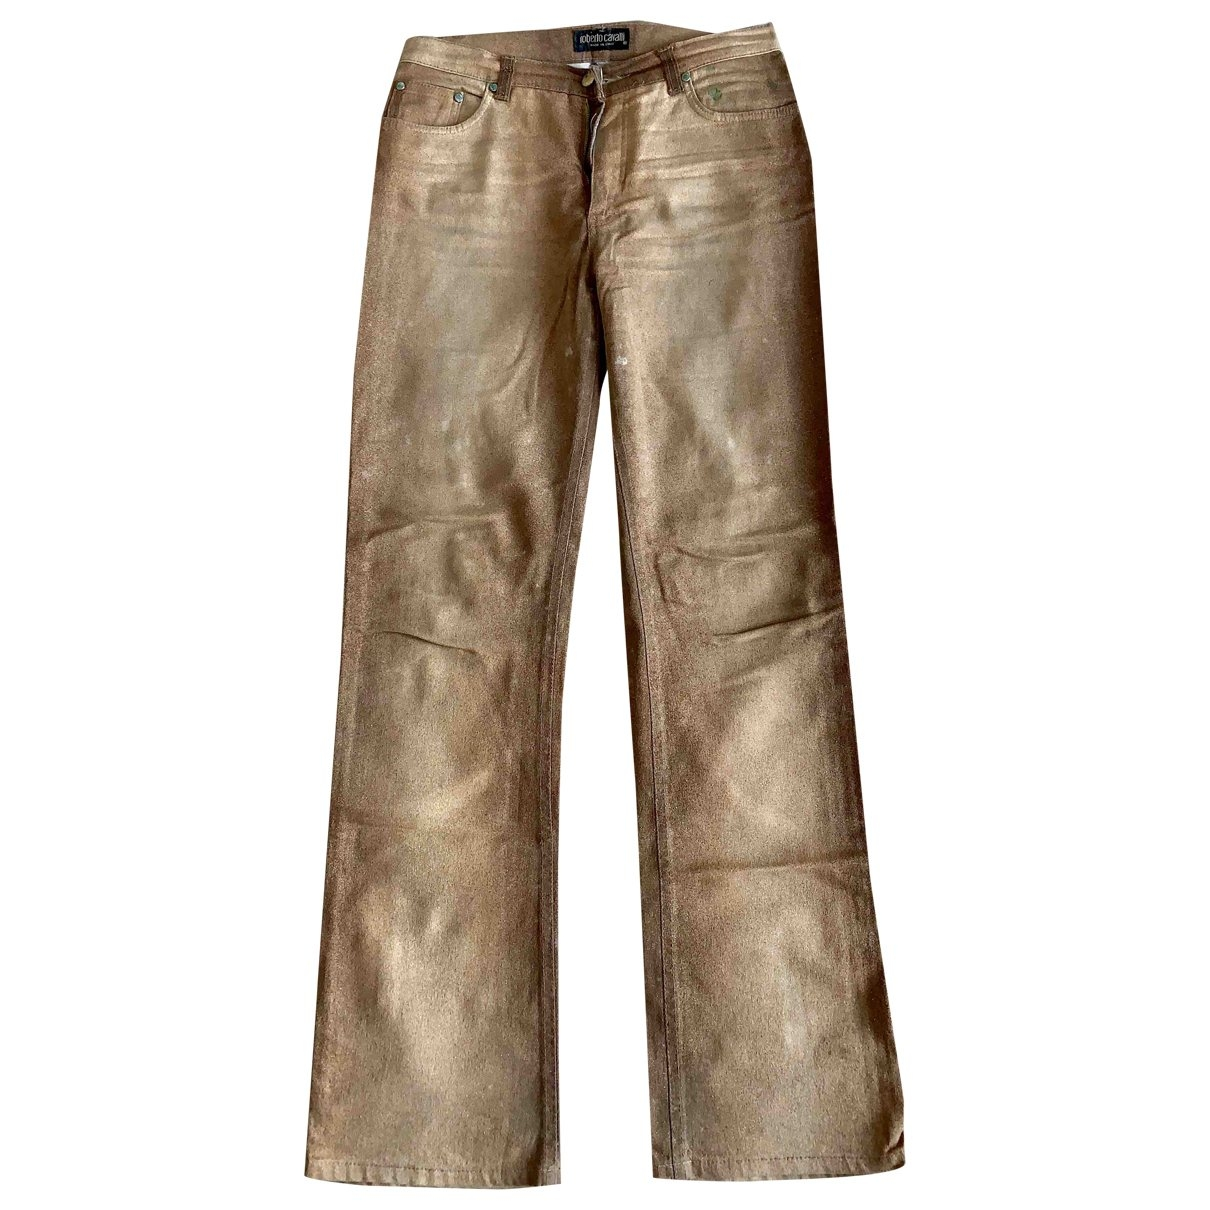 Roberto Cavalli \N Gold Denim - Jeans Trousers for Women XS International